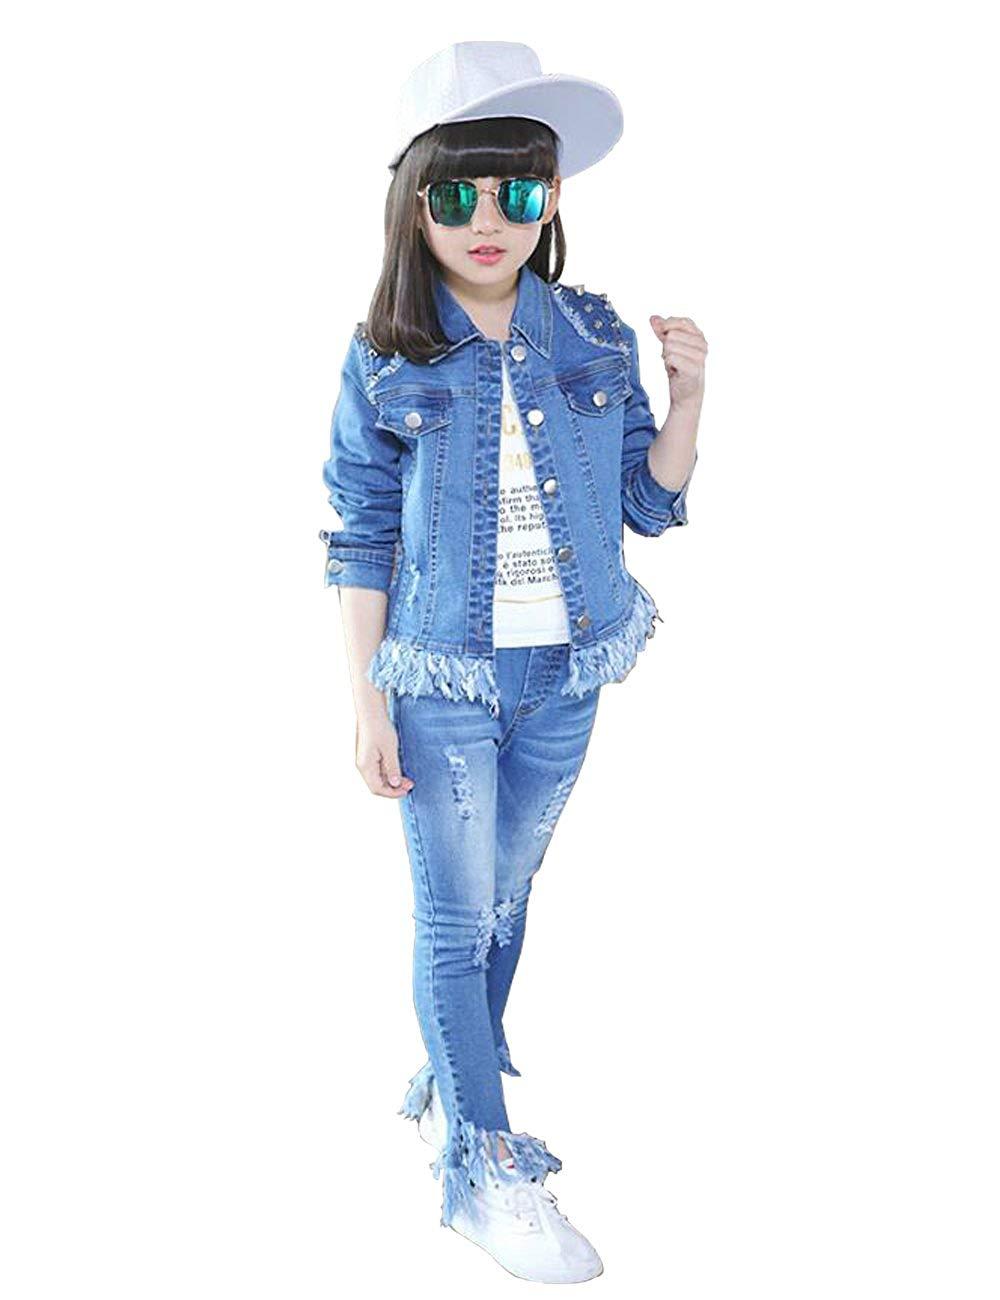 bf6910c4102f7 Get Quotations · Star Flower Big Girls Denim Jacket Jeans Set